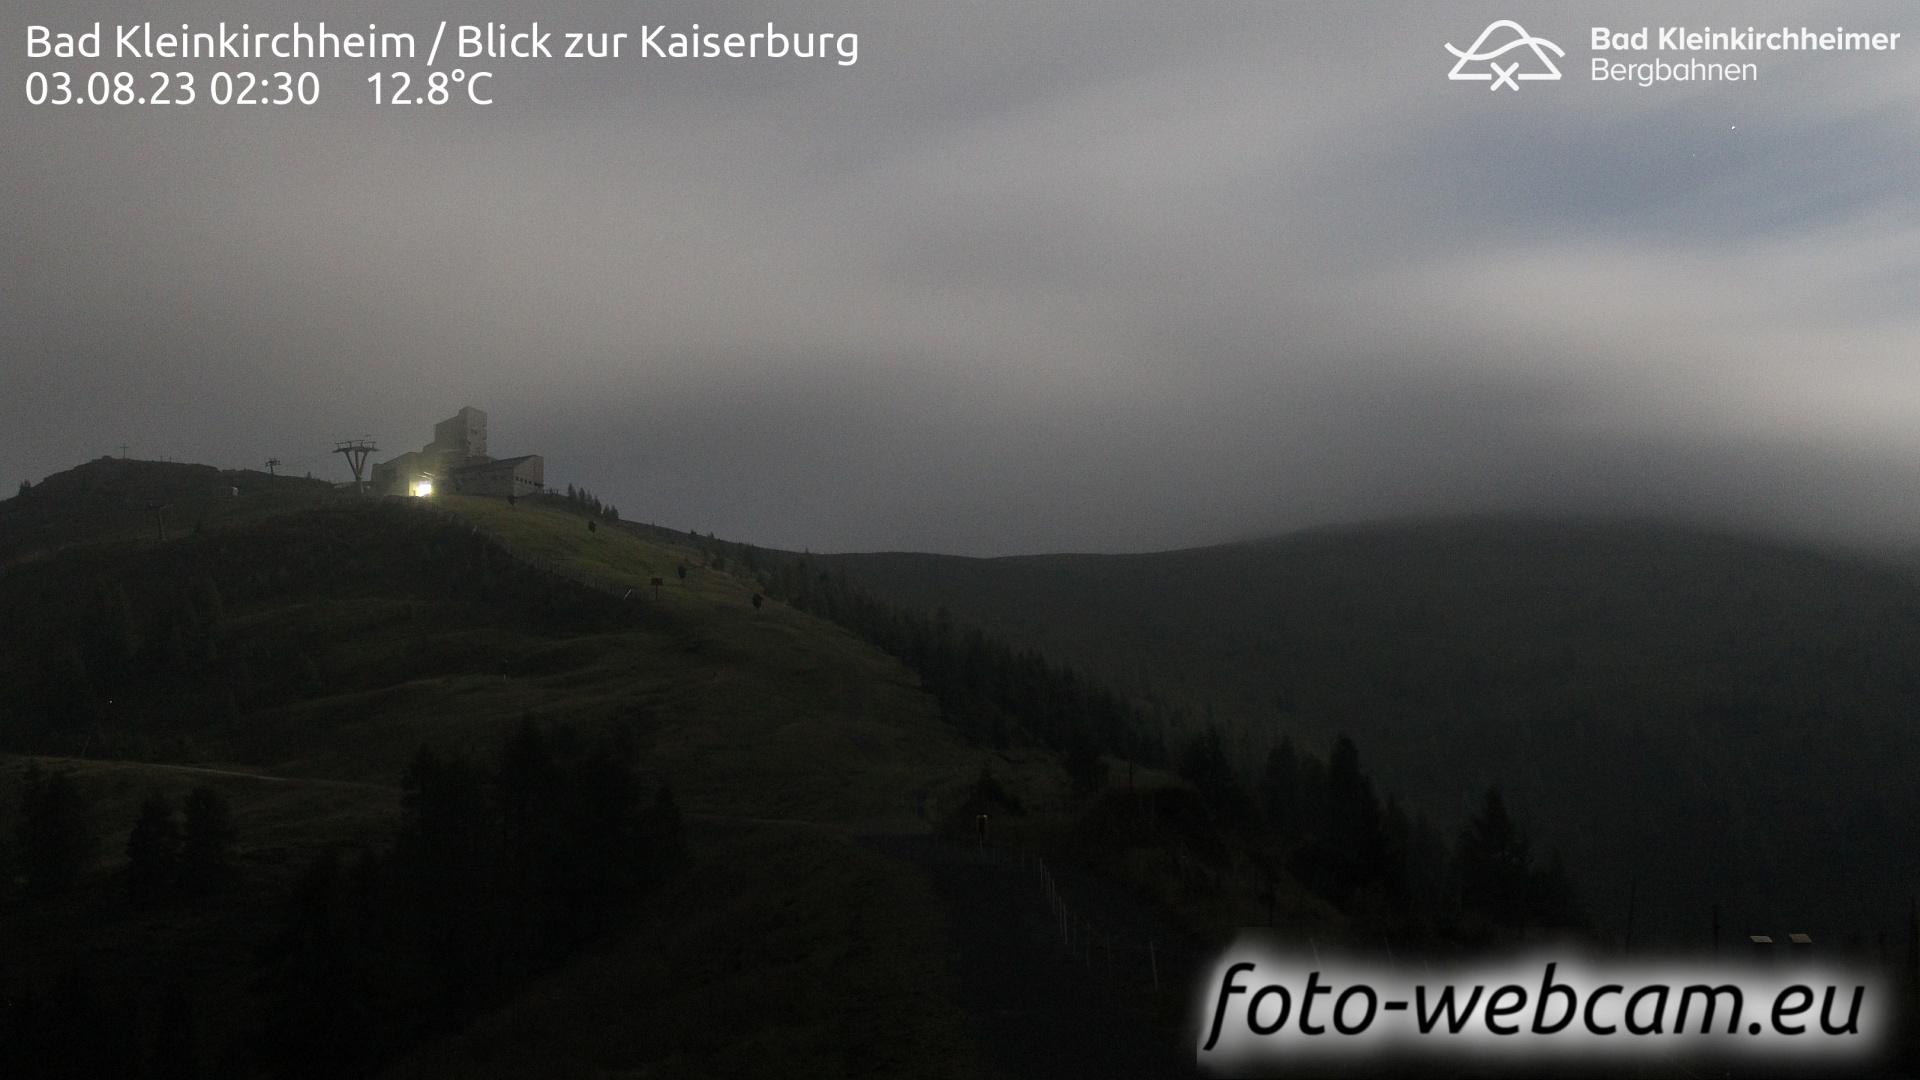 Bad Kleinkirchheim Thu. 02:23